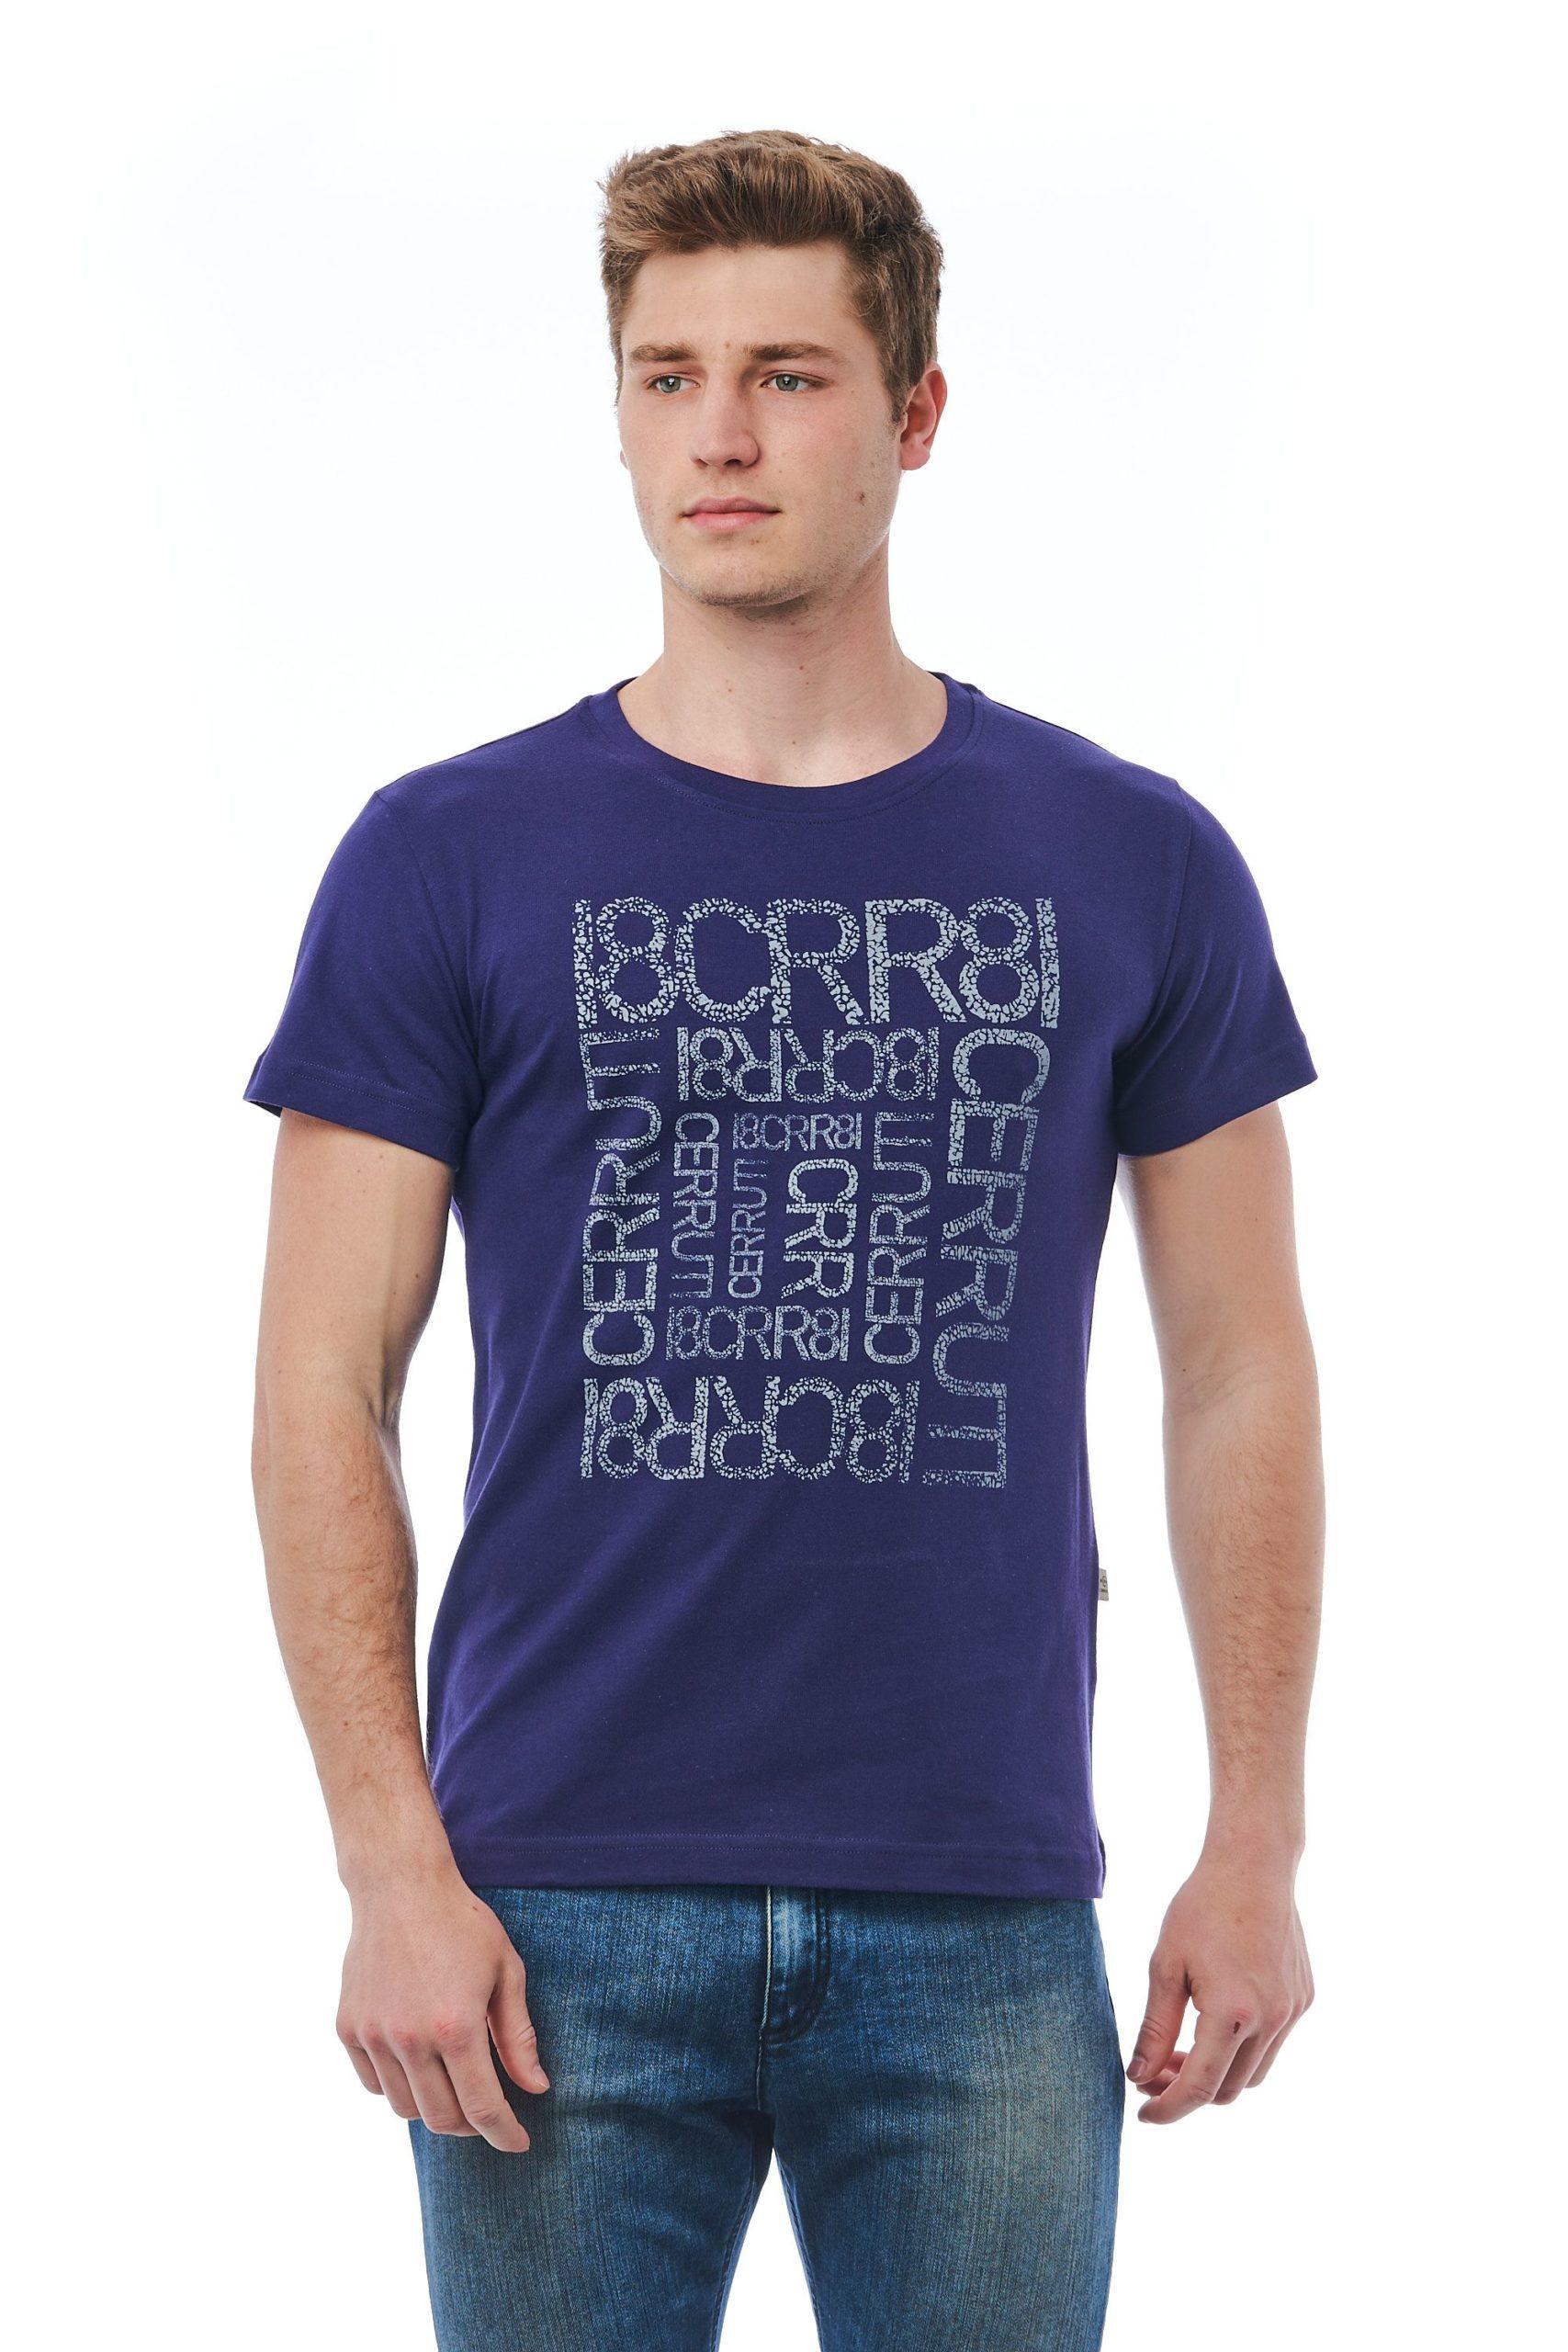 Cerruti 1881 Men's Blu Navy T-Shirt Blue CE1409930 - M